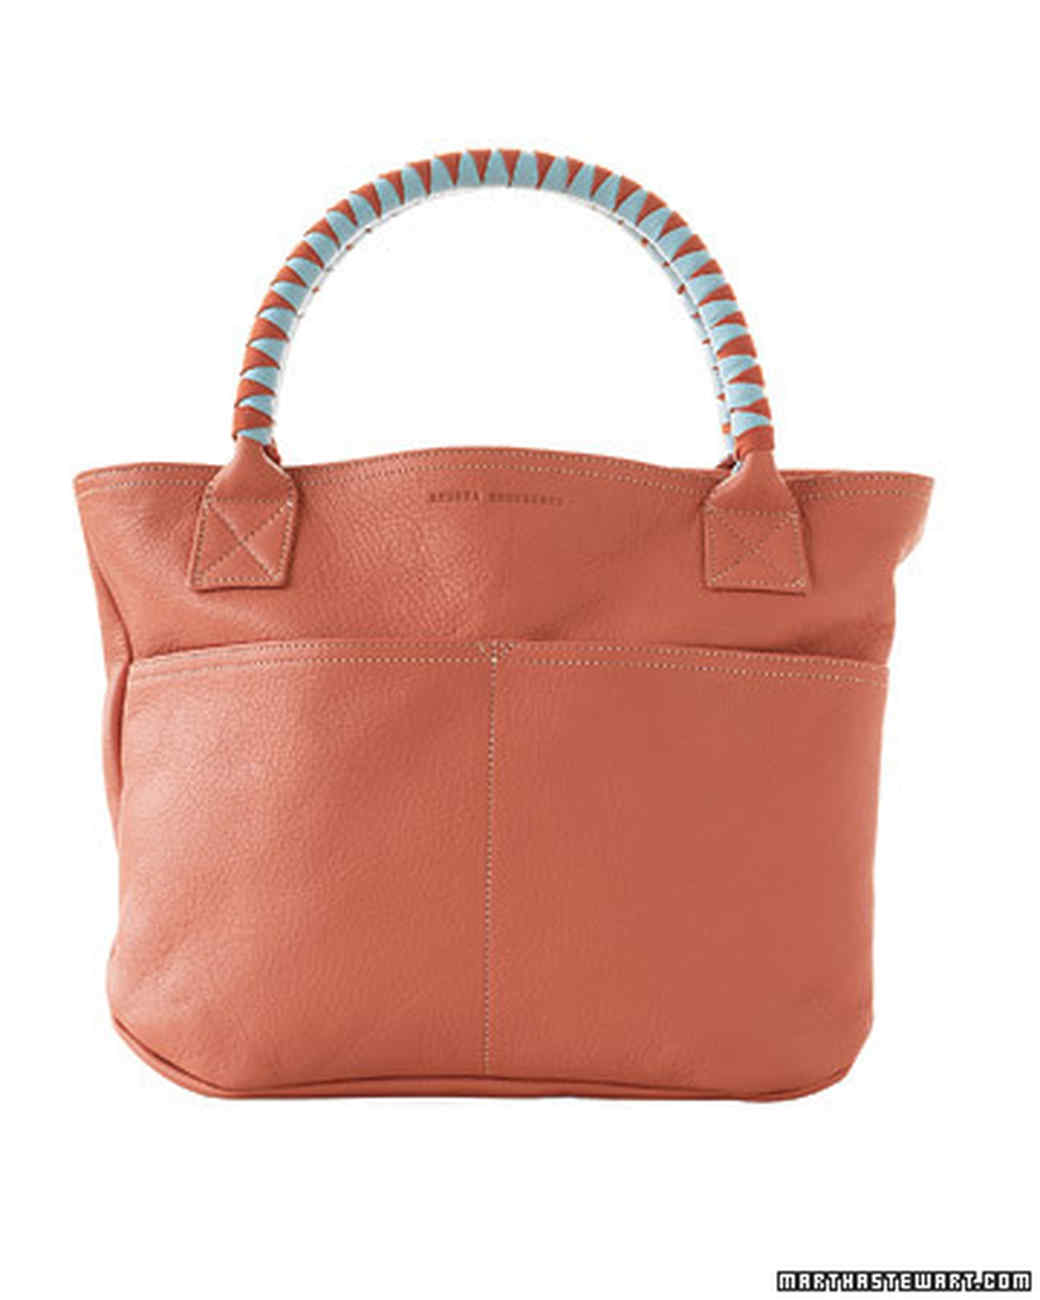 Chic Tweak: Handbag Helper